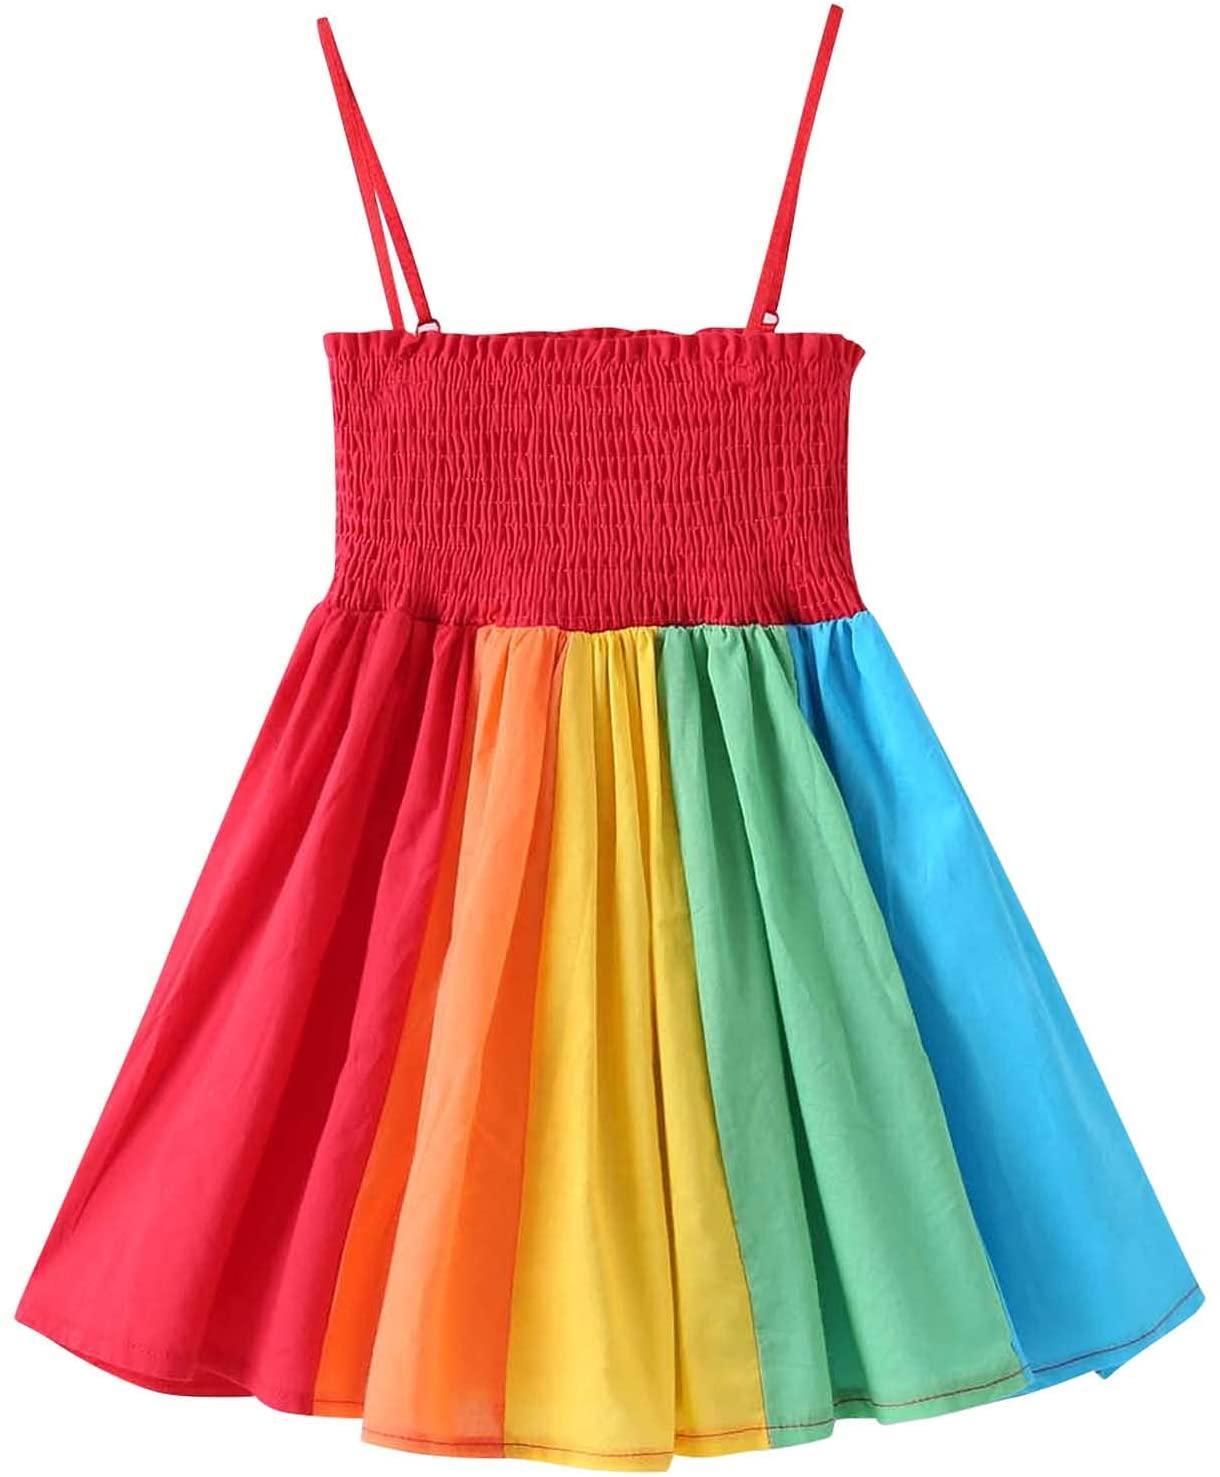 HATOYS 아기 소녀 드레스 SHIRRED 허리 PLEATED 드레스 레인보우 하단 스트랩 드레스